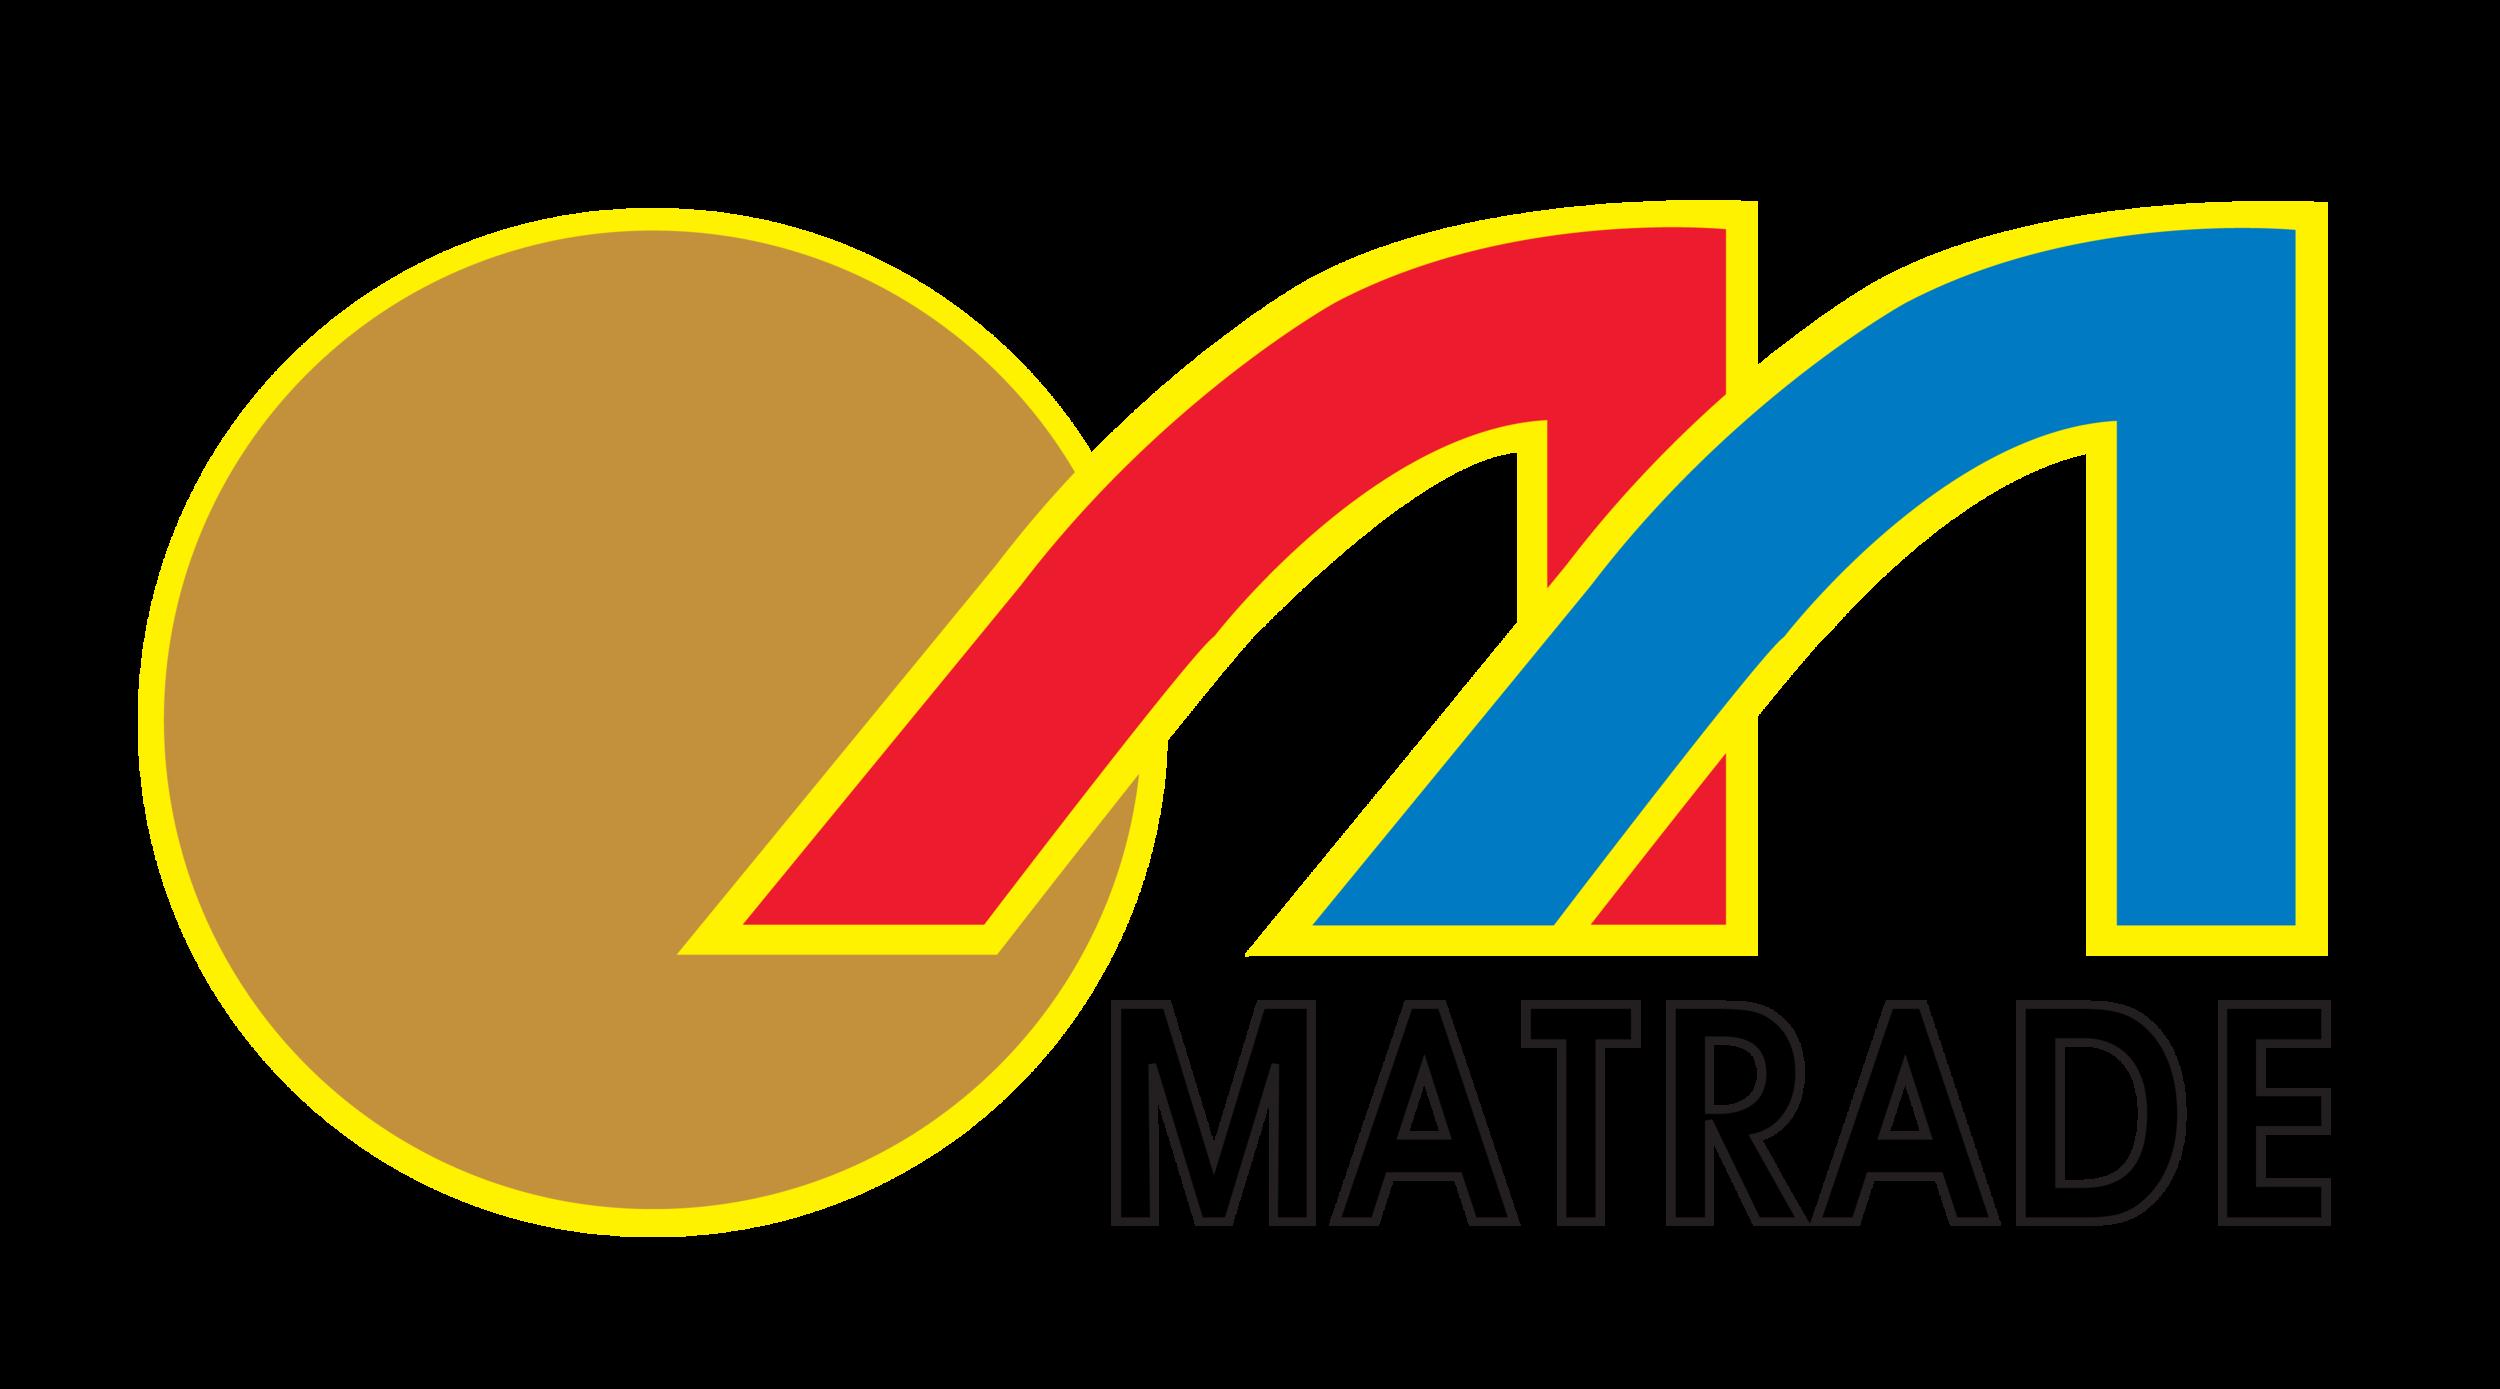 logo MATRADE.png